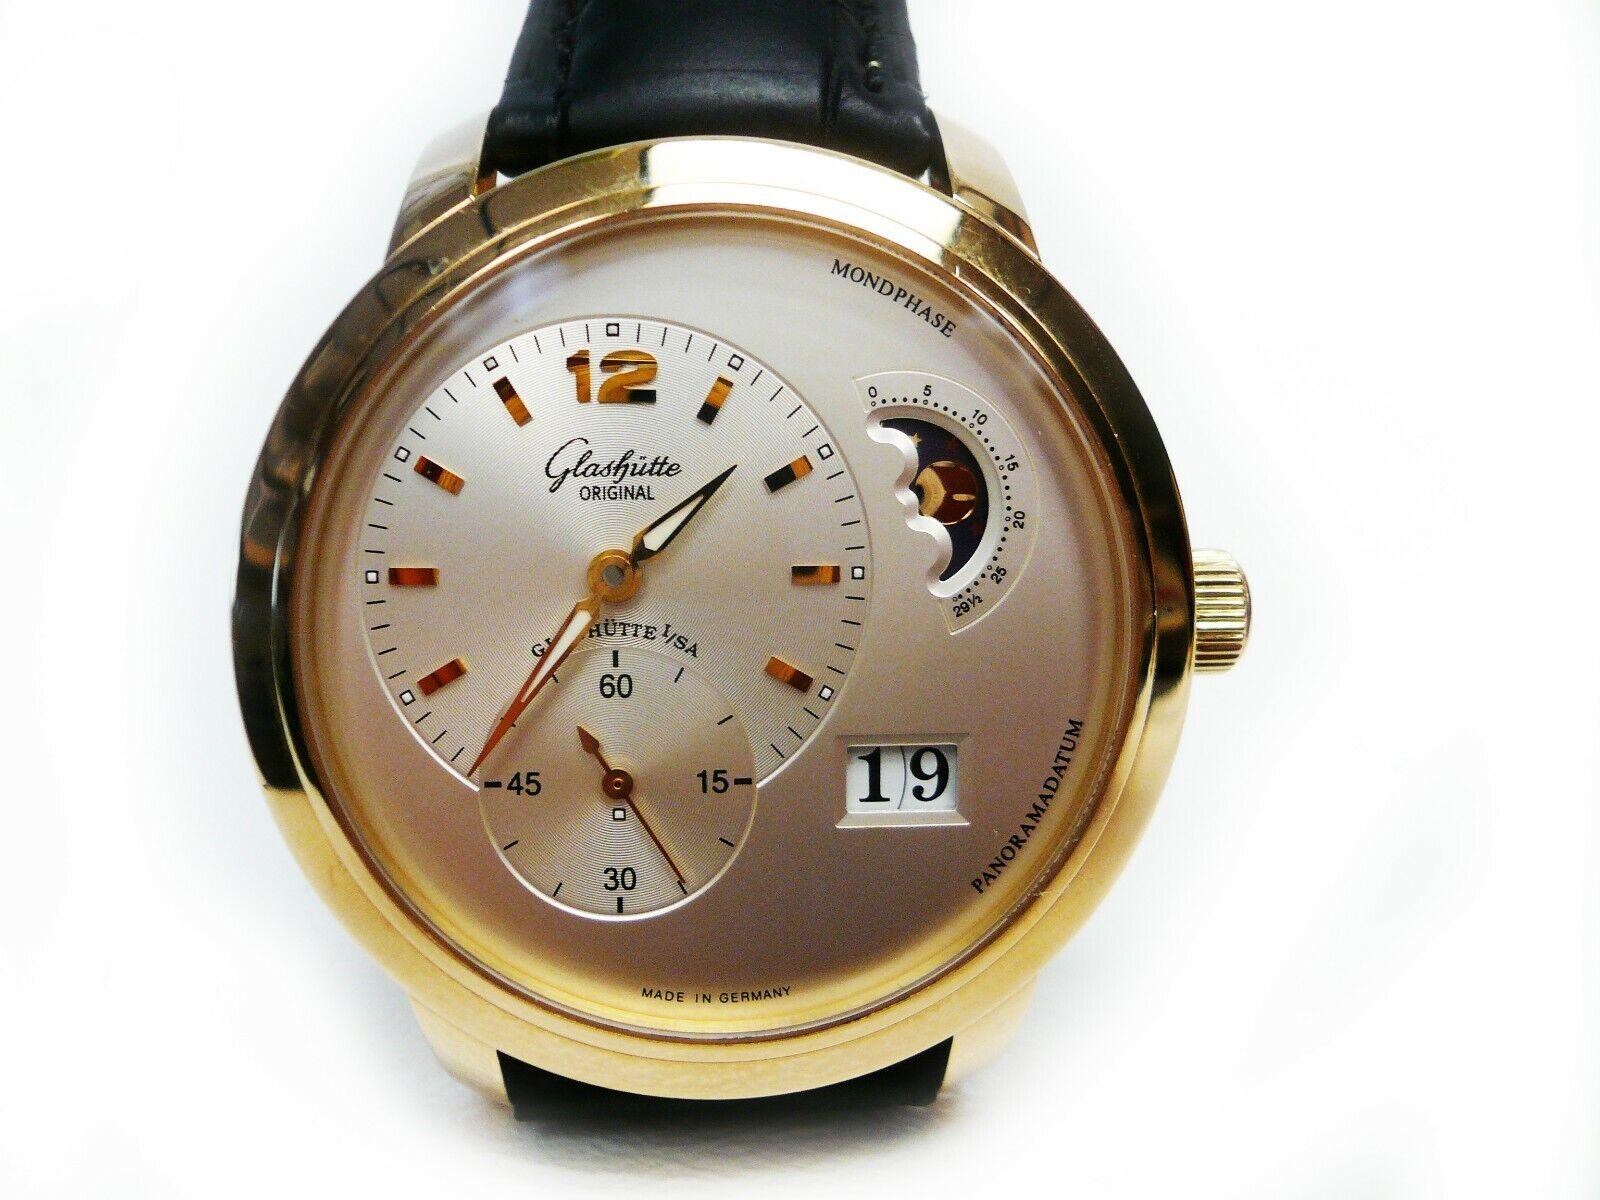 Glashutte Original Senator Panorama Date Moonphase 18K Gold Strap Wristwatch - watch picture 1